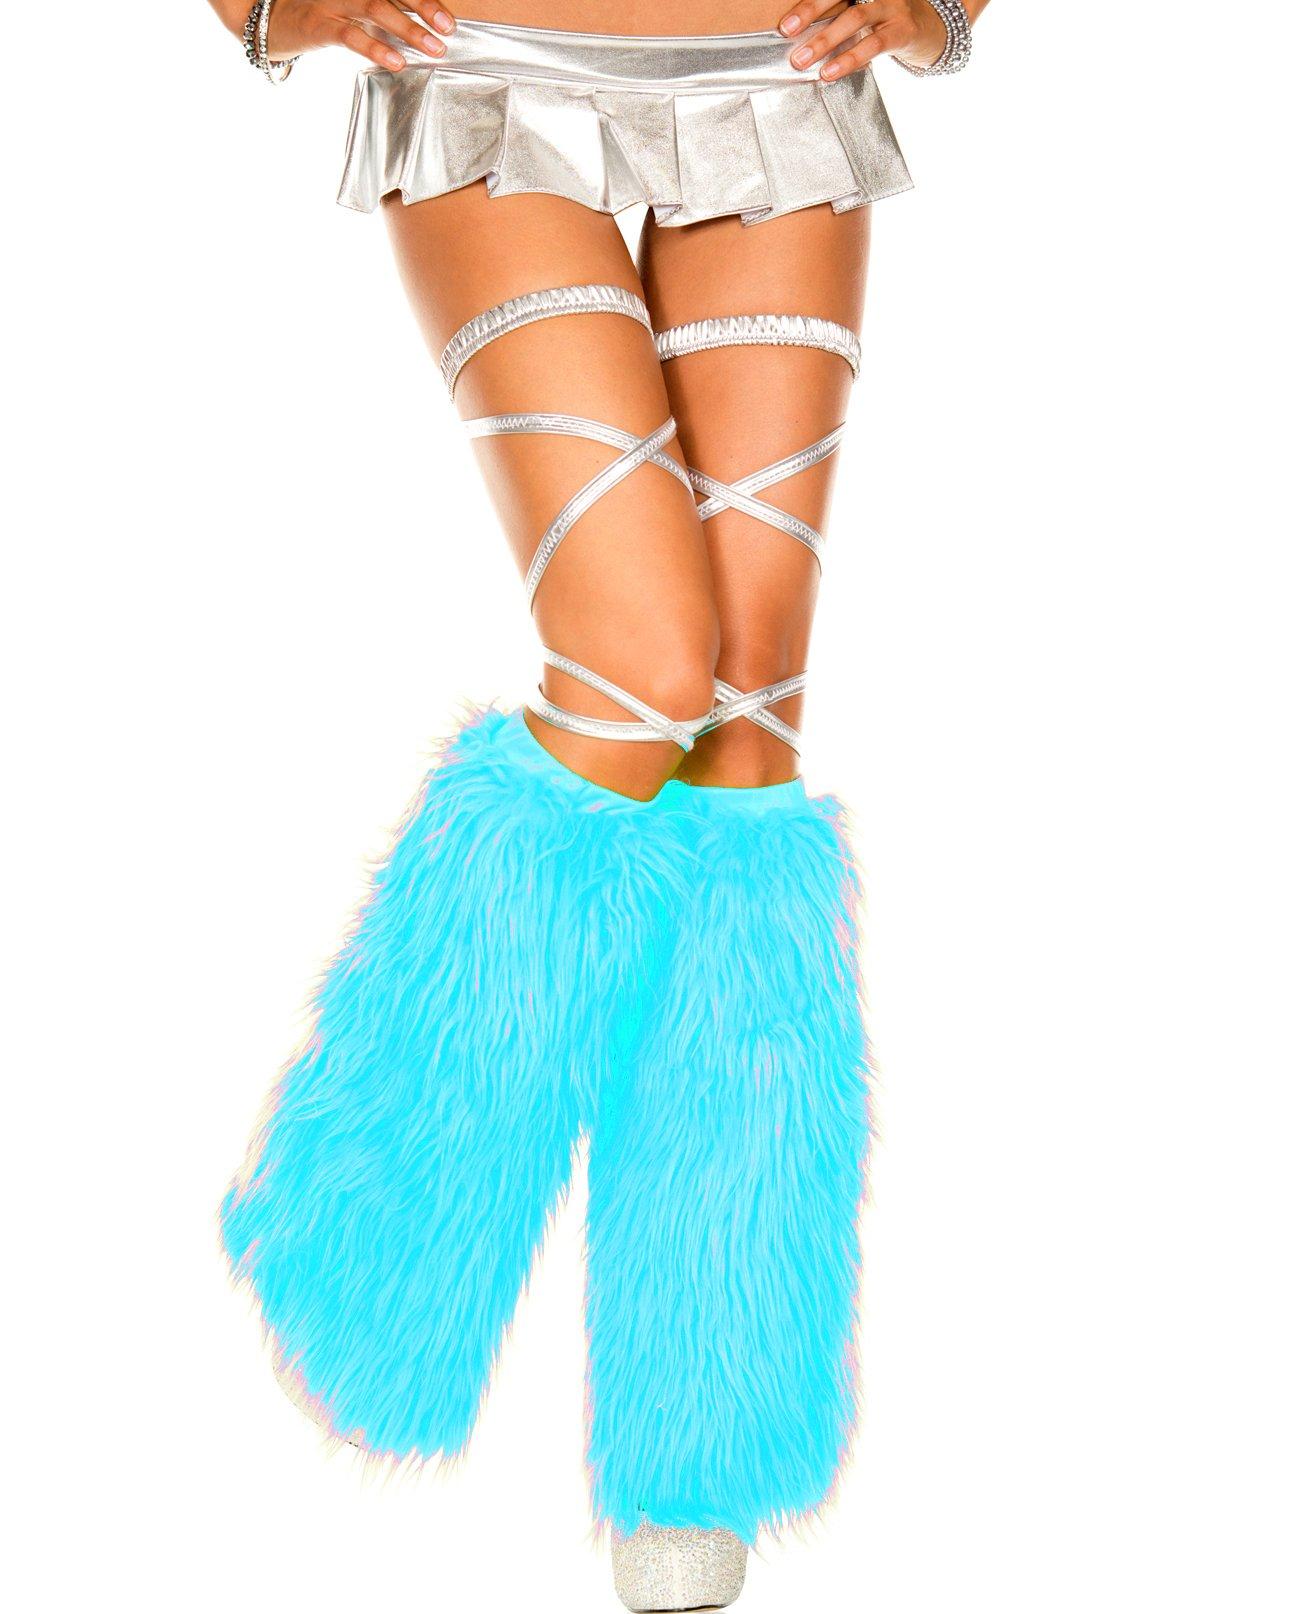 MUSIC LEGS Women's Faux Fur Leg Warmers, Turquoise, One Size